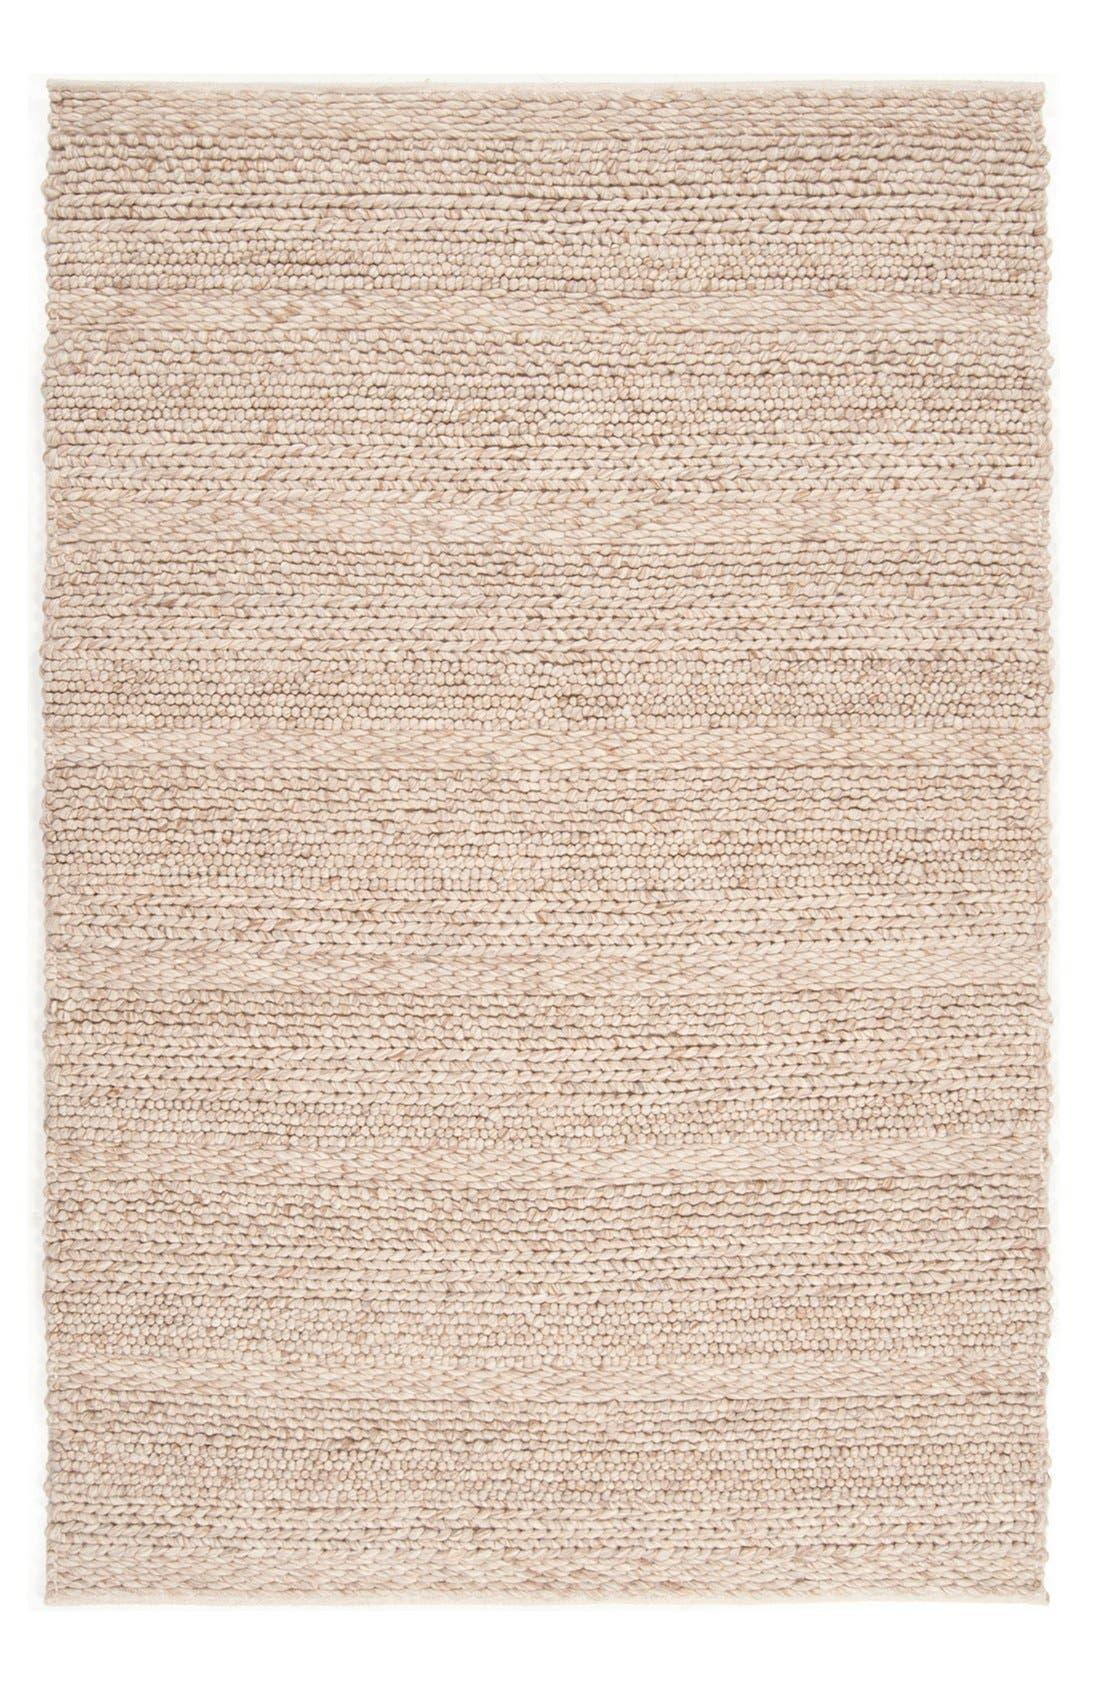 'Tahoe' Wool Rug,                             Main thumbnail 1, color,                             900